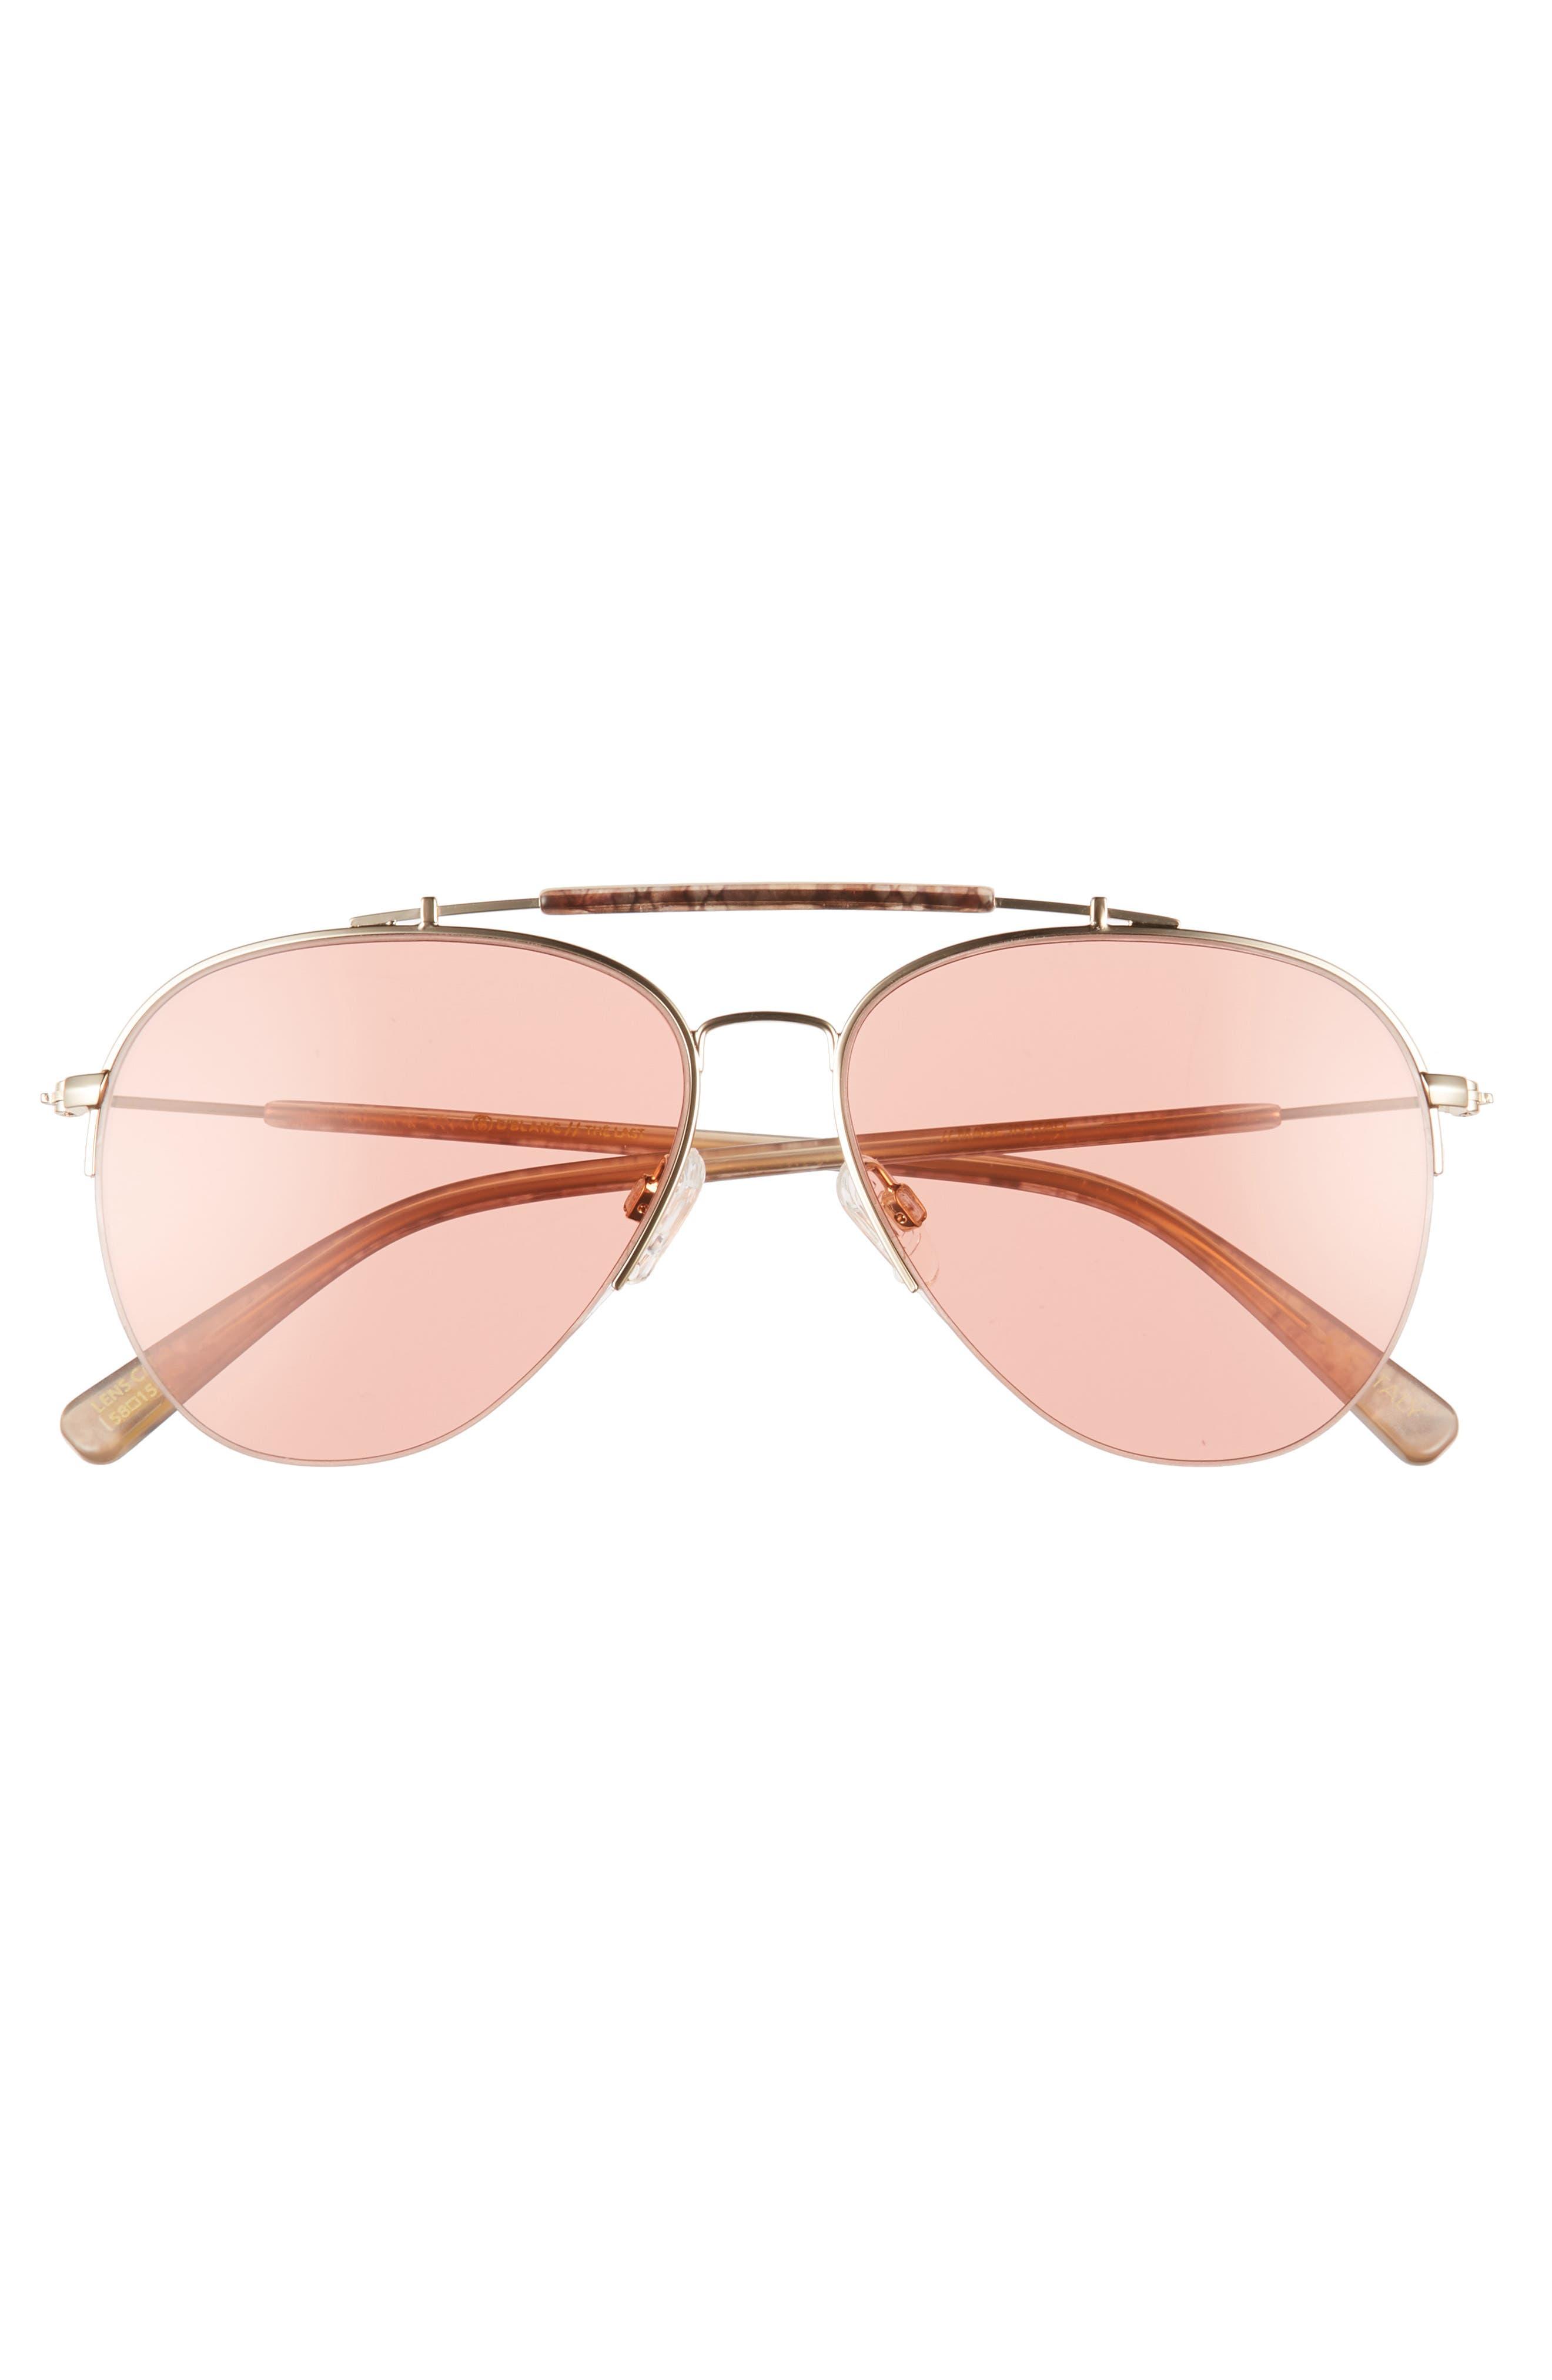 D'BLANC x Amuse Society The Last 58mm Aviator Sunglasses,                             Alternate thumbnail 3, color,                             Rattlesnake/ Persimmon